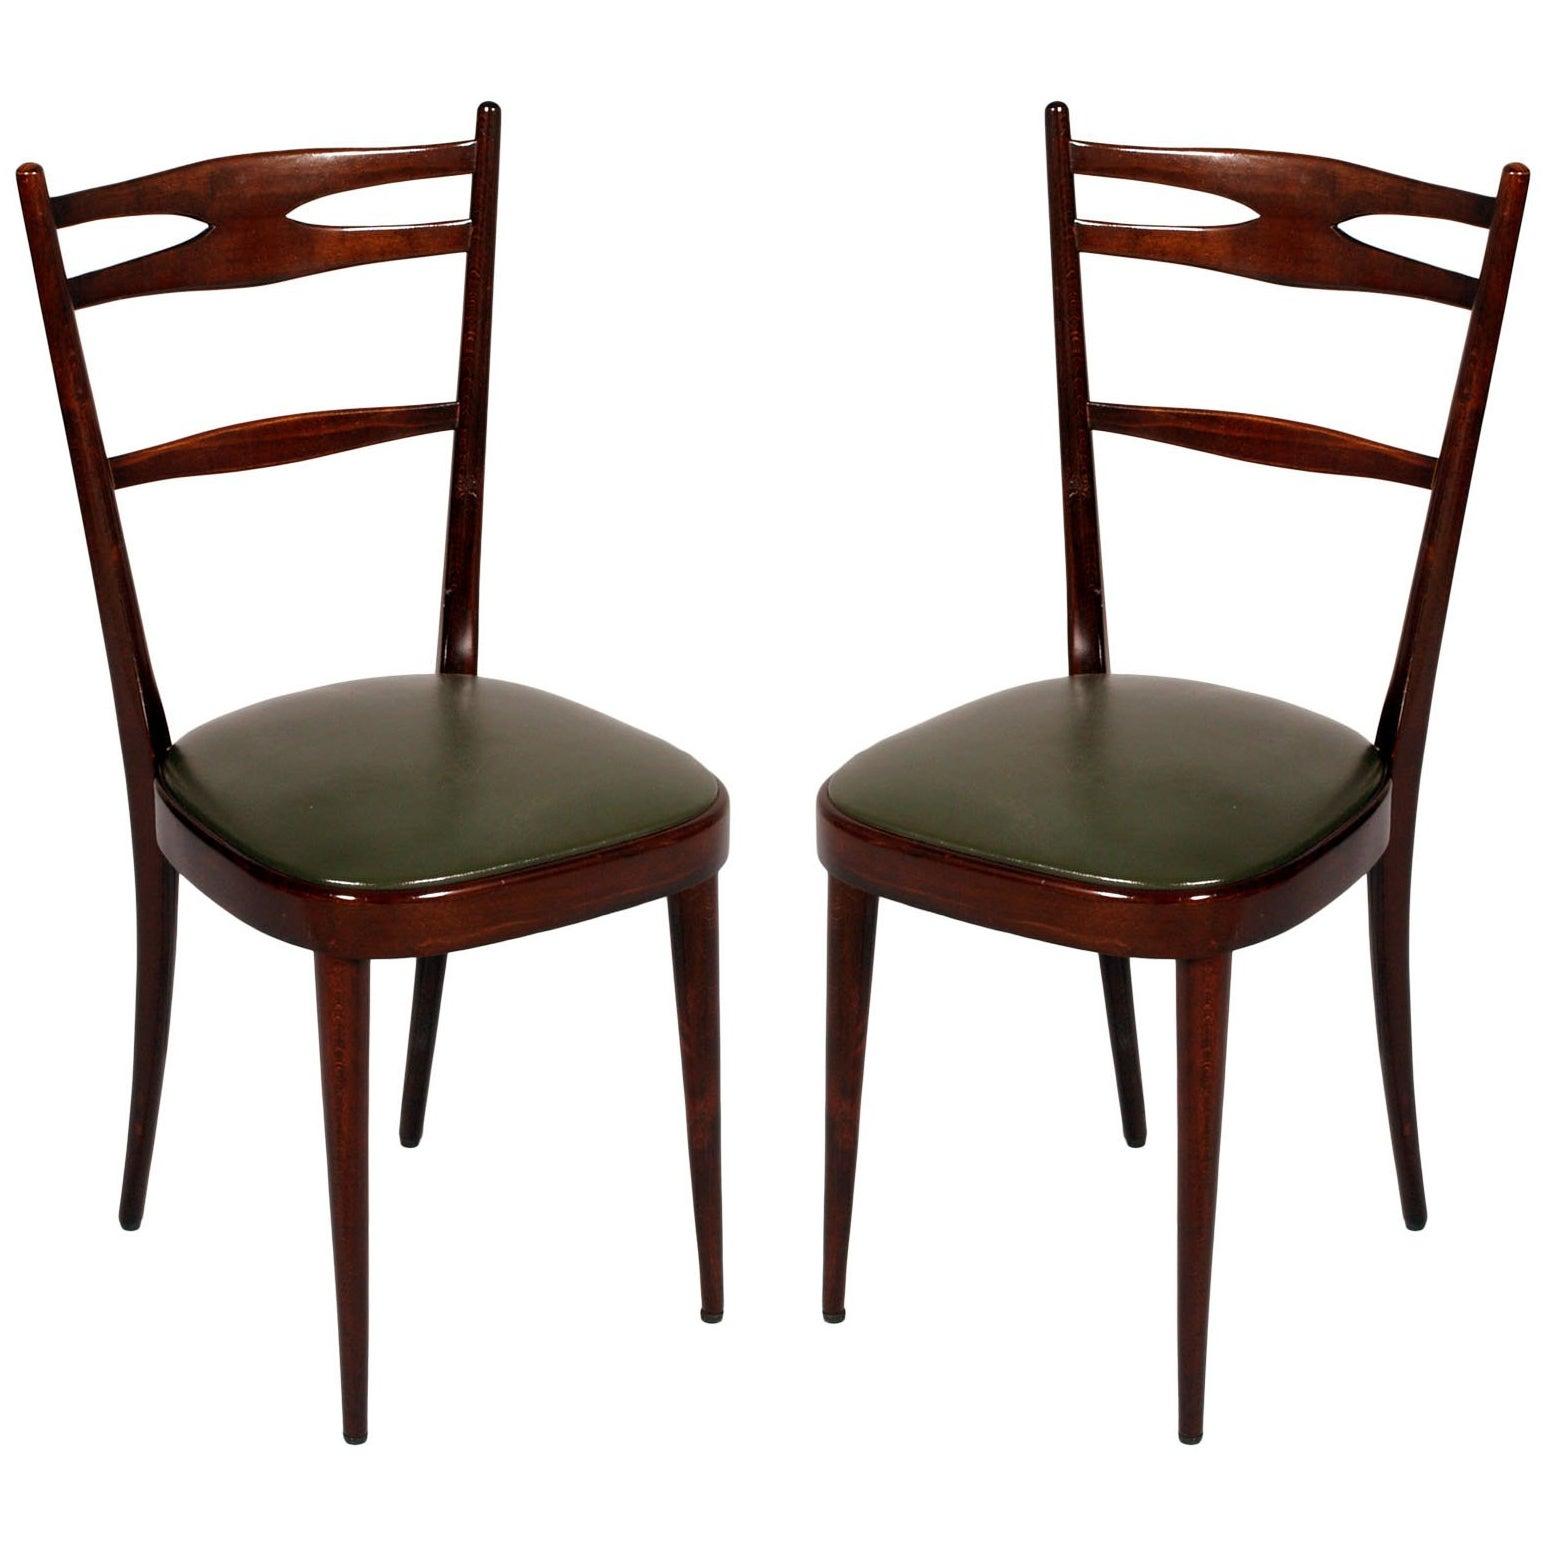 Italian 1950s Side Chairs Carlo de Carli Attributed in Brown Walnut Wax Polished